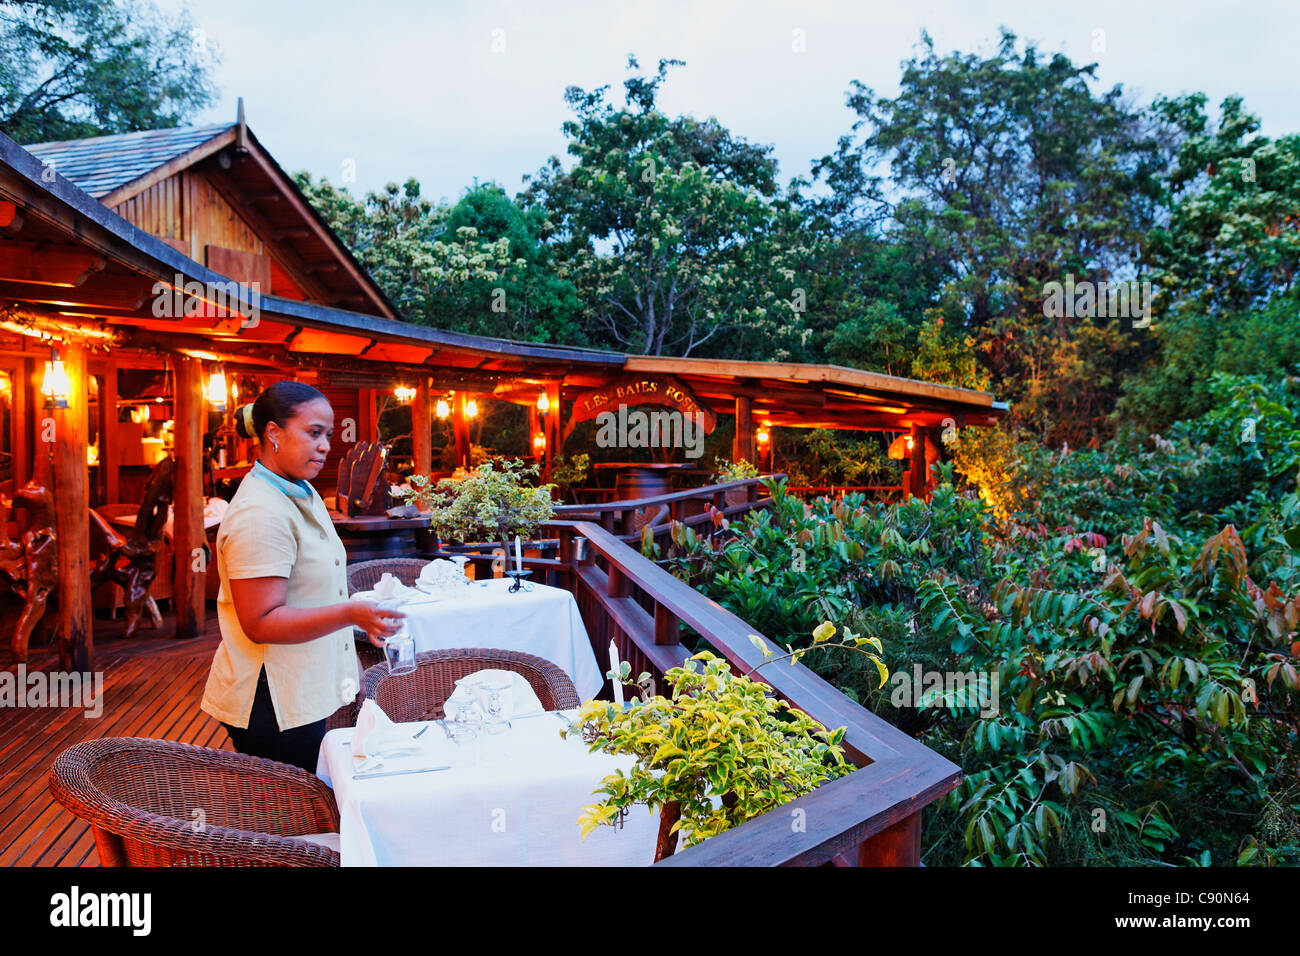 Hotel Lodge Tamarin in La Possession, La Reunion, Indian Ocean - Stock Image